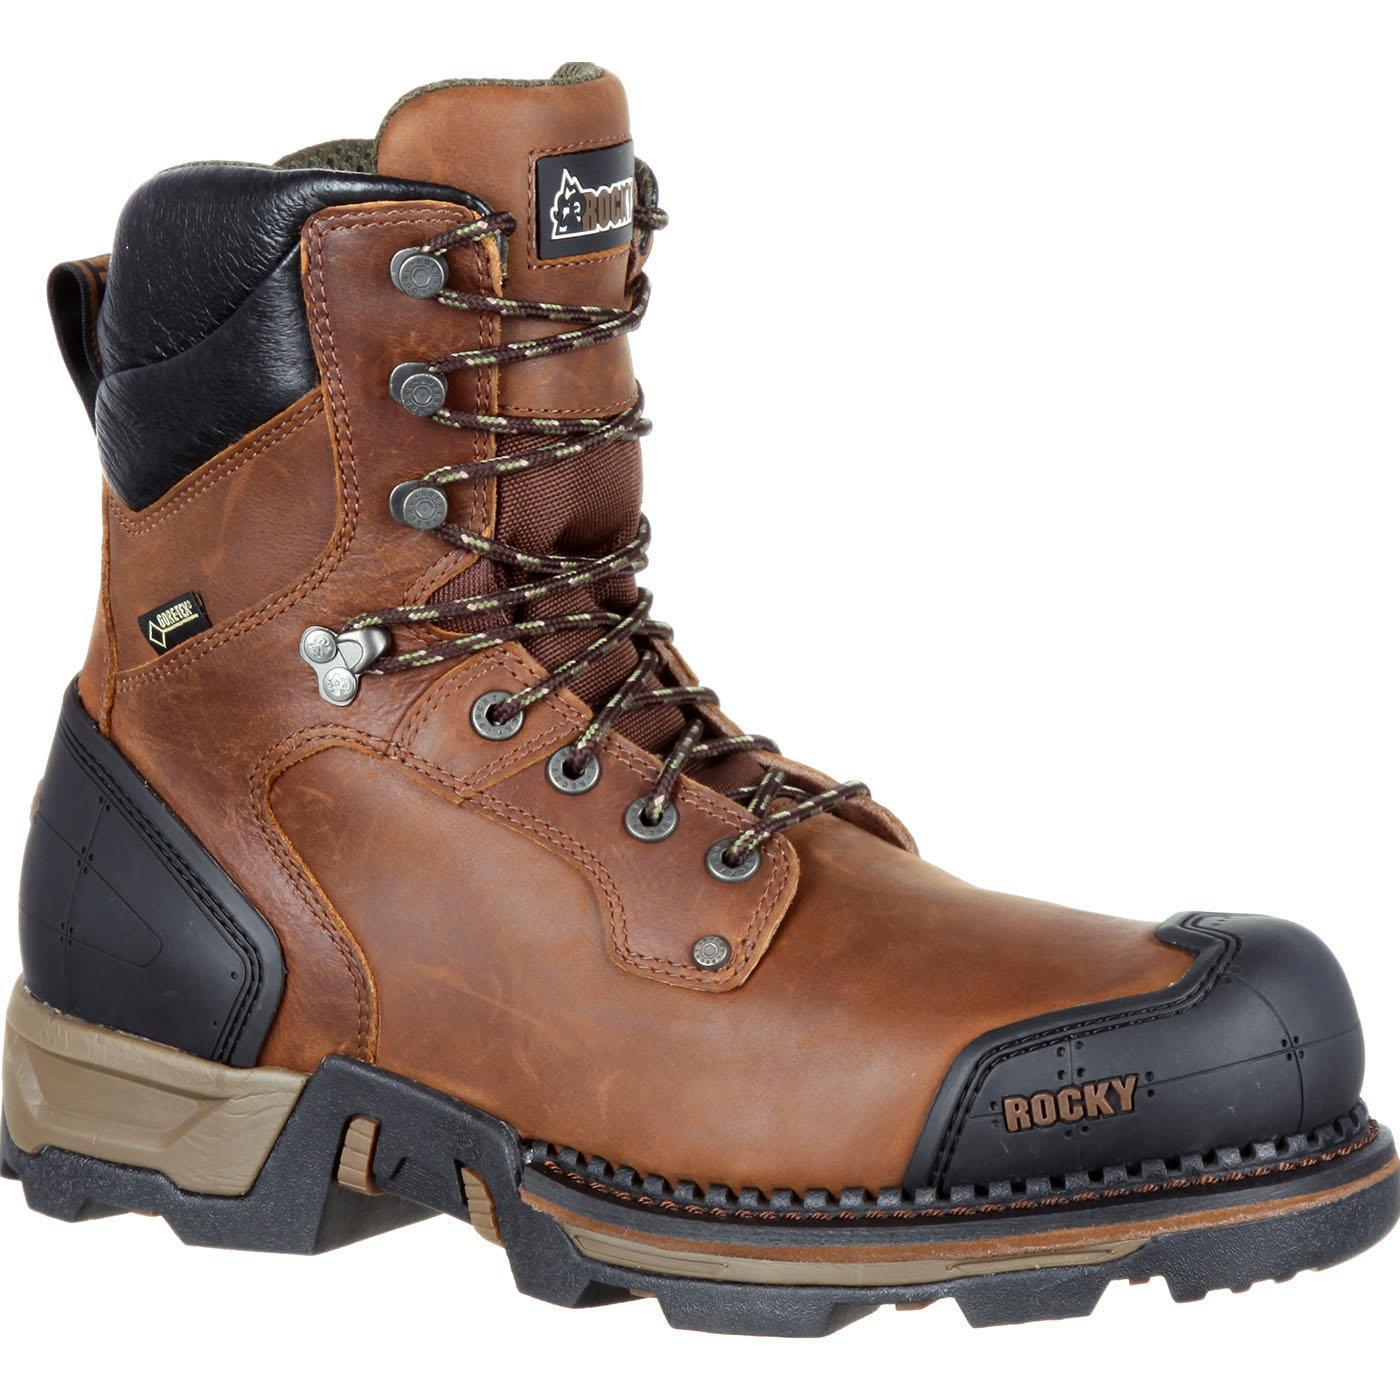 Rocky Maxx Waterproof Outdoor Boots, #RKS0323